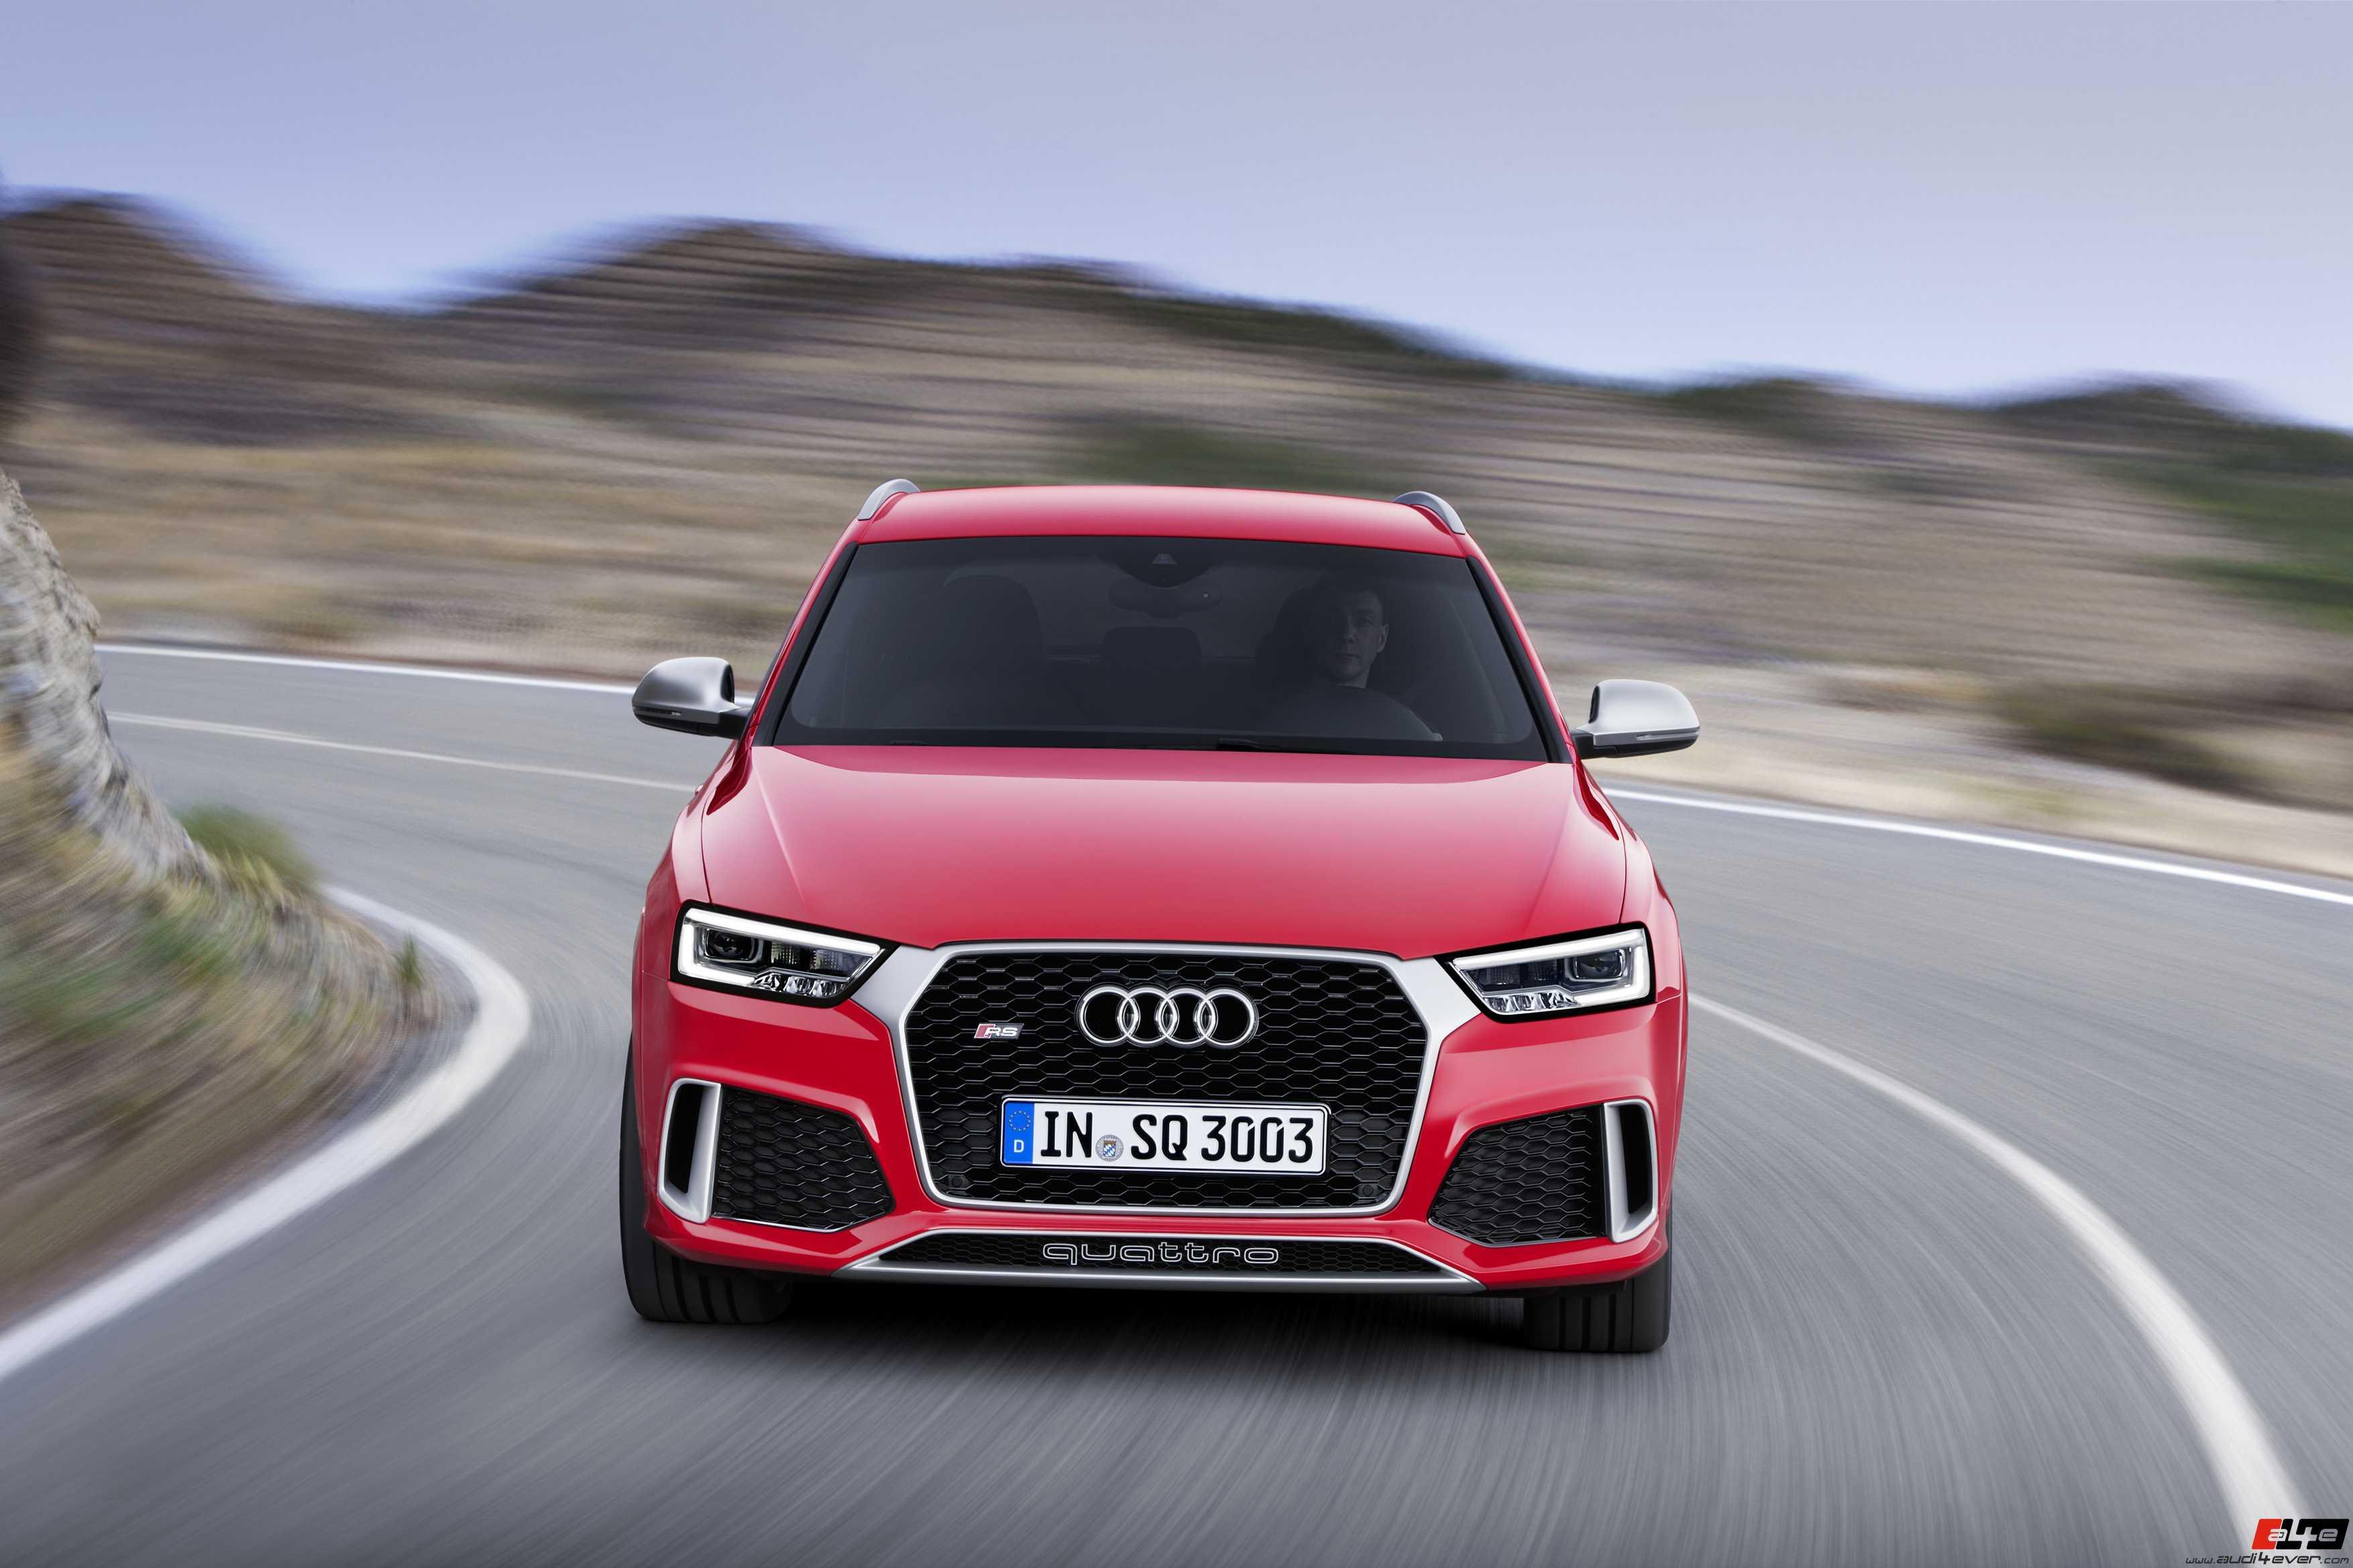 Audi q7 2019 модельного года: фото, видео, характеристики и комплектации